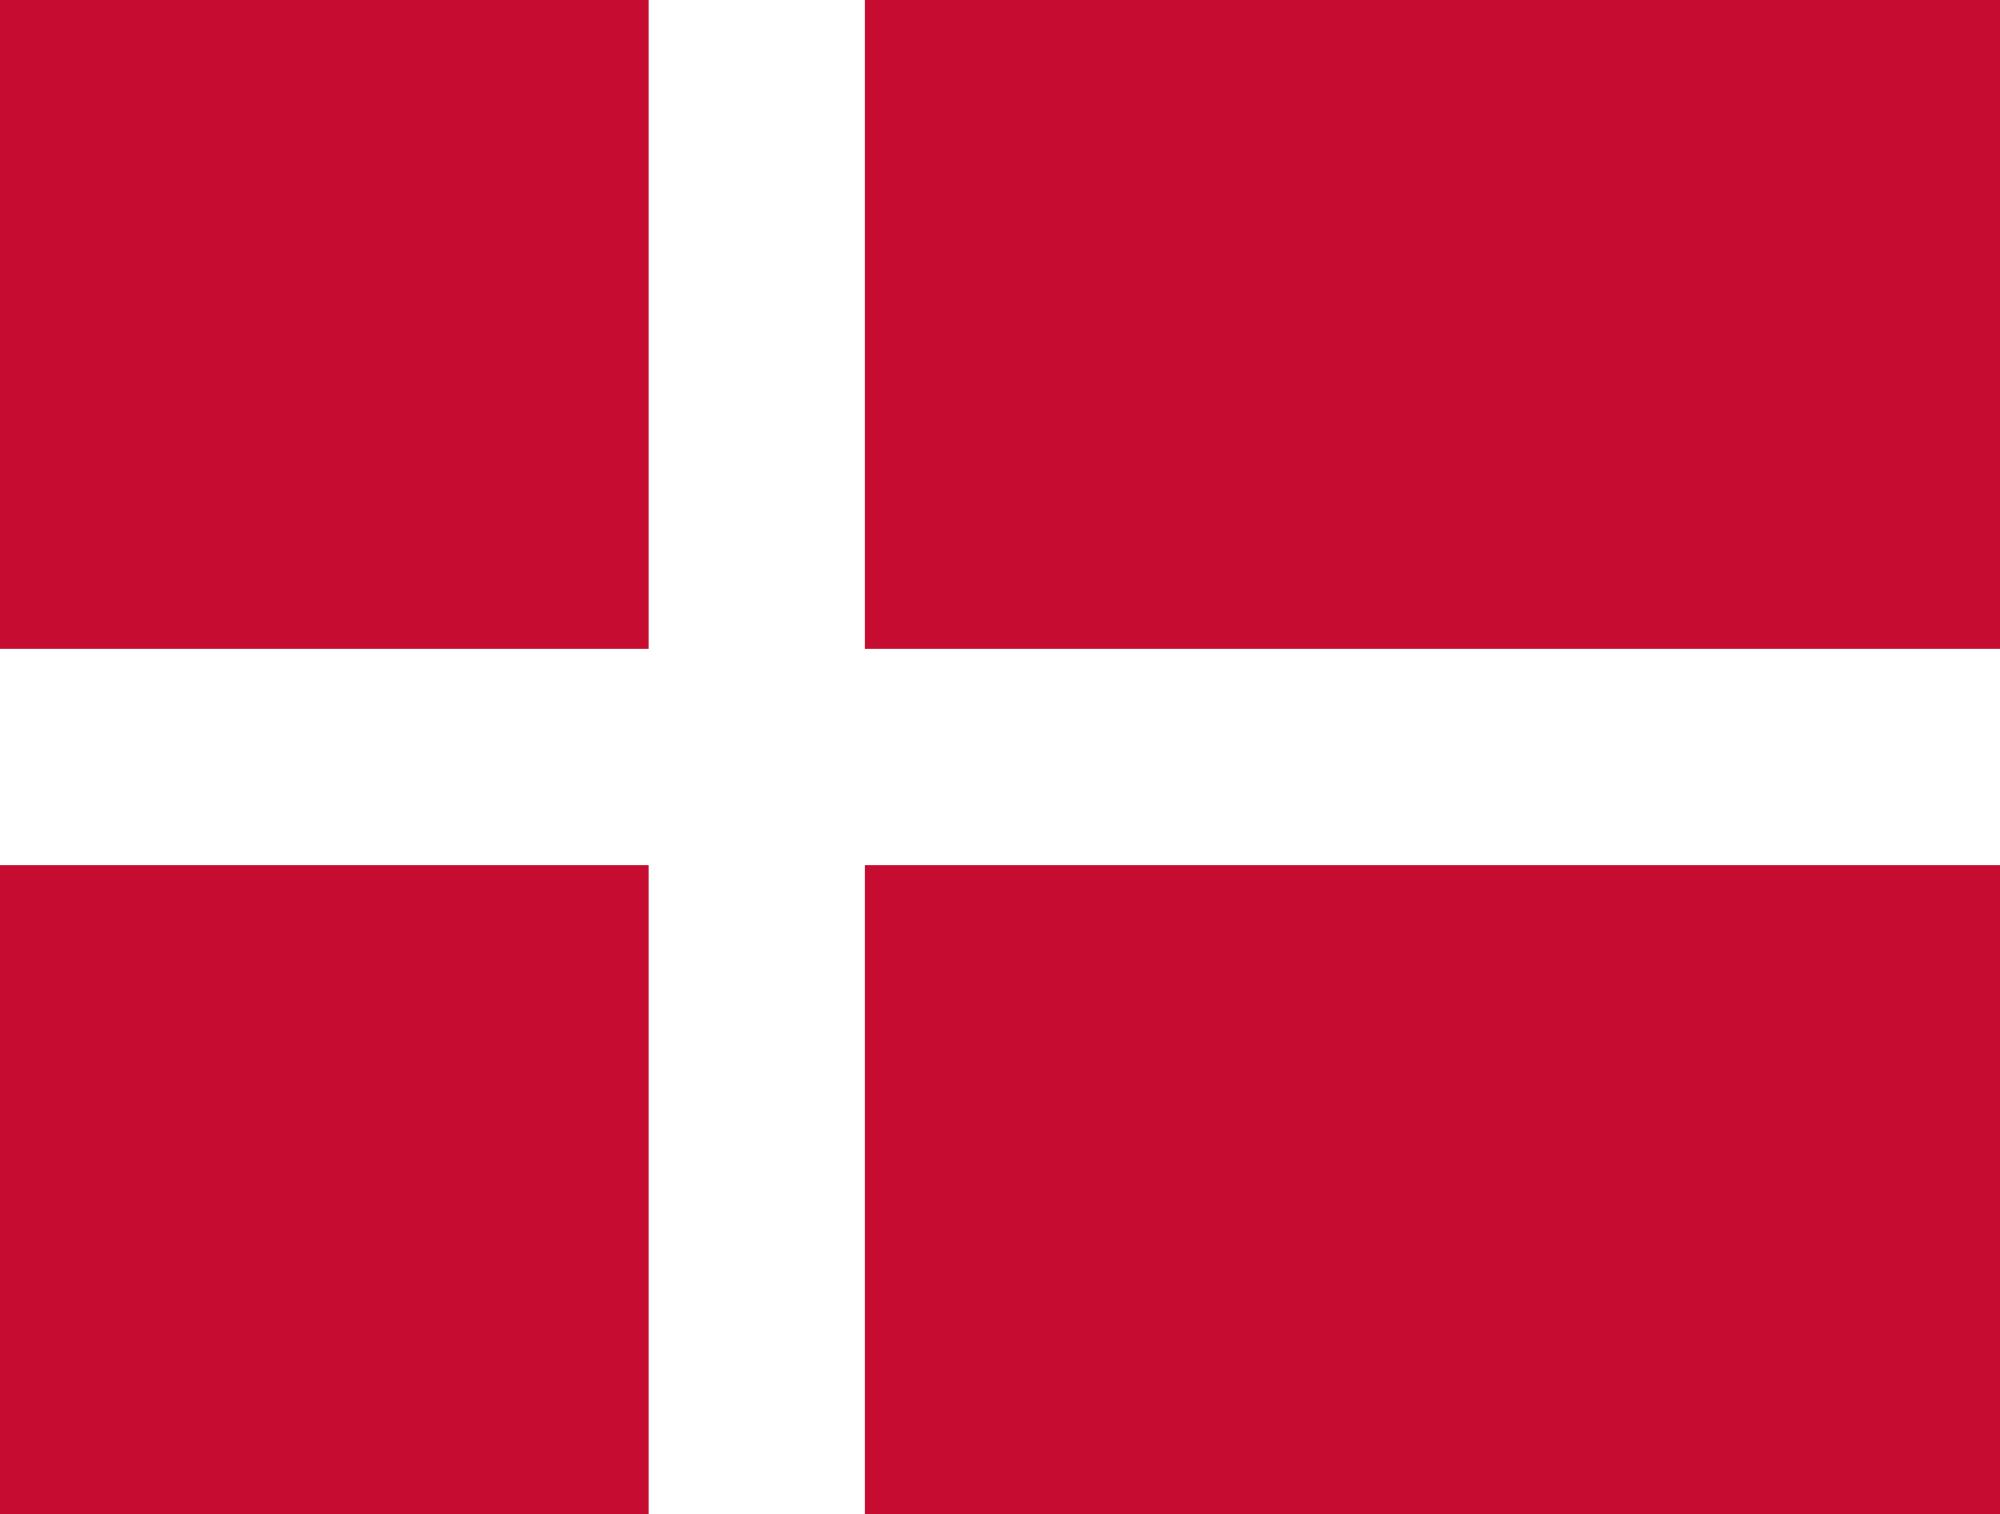 Denmark svg #20, Download drawings